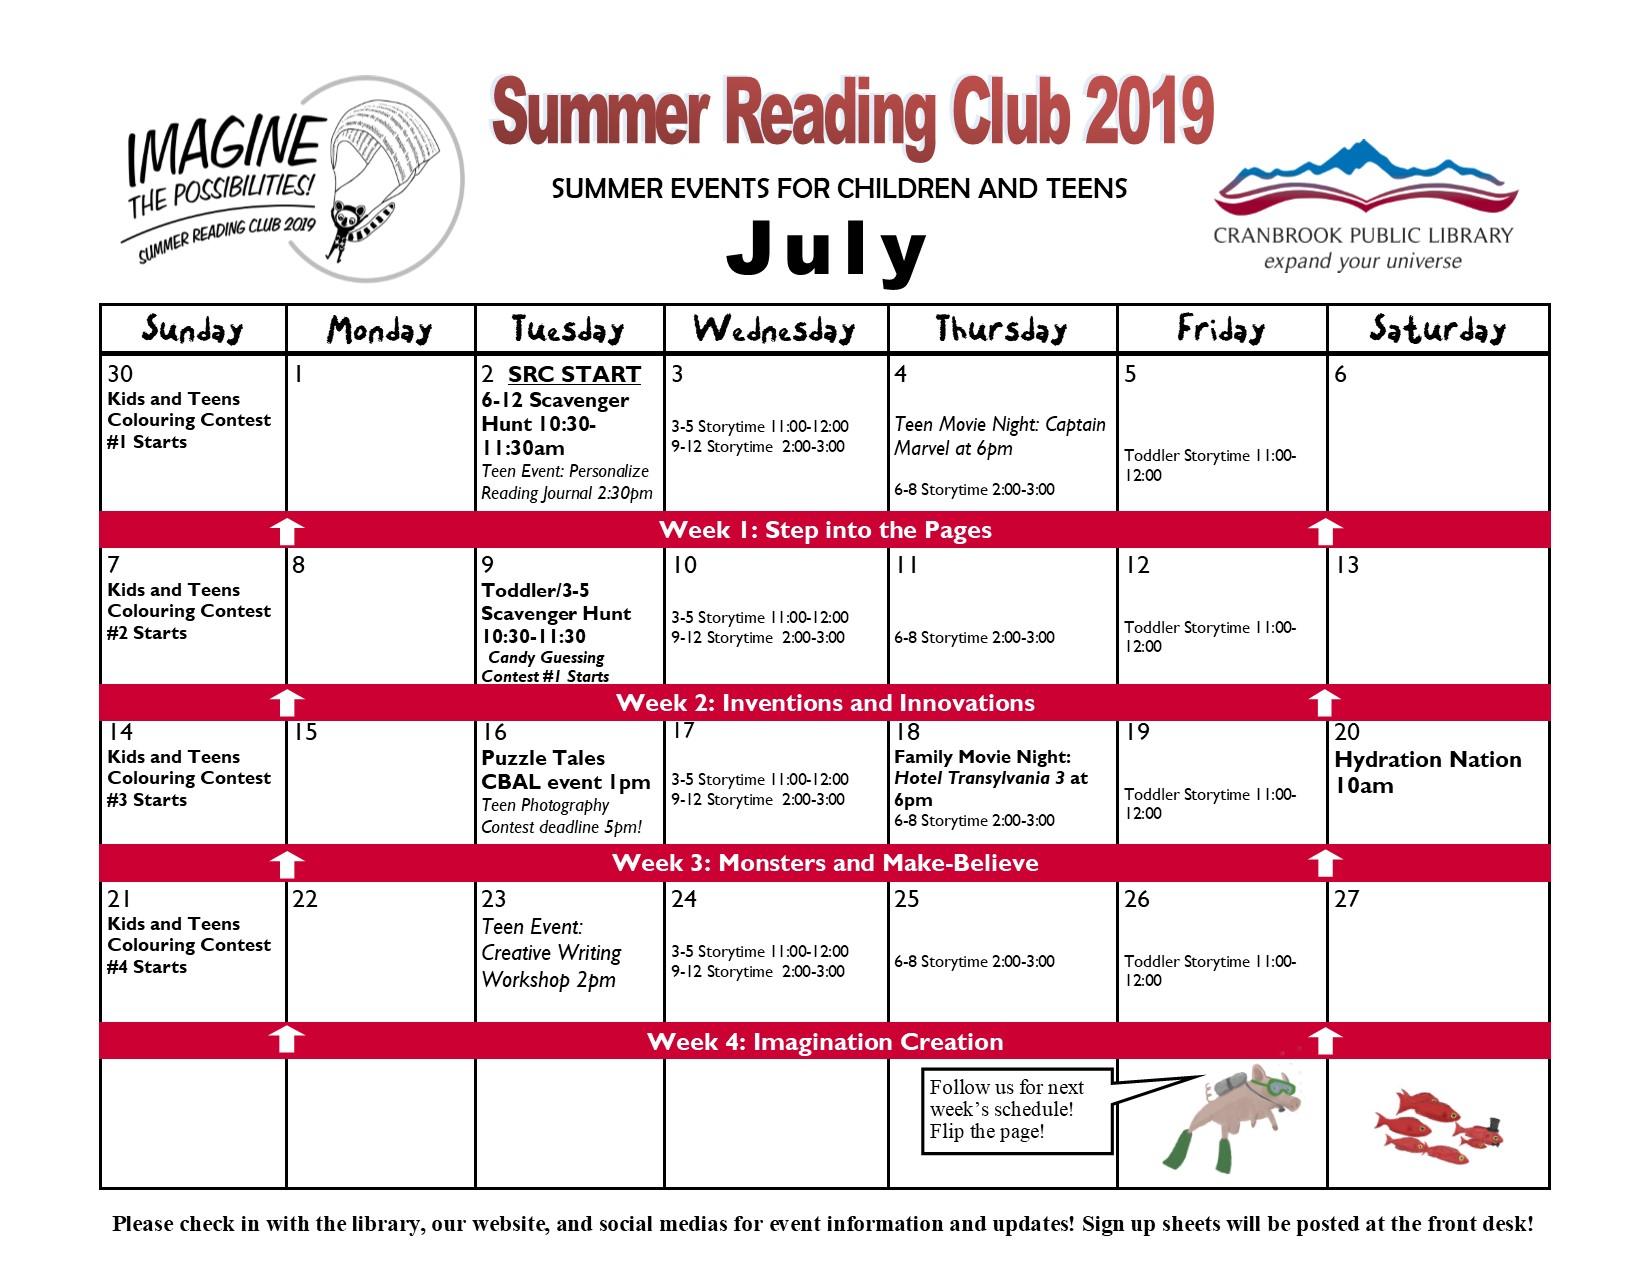 Summer Reading Club 2019 @ Cranbrook Public Library